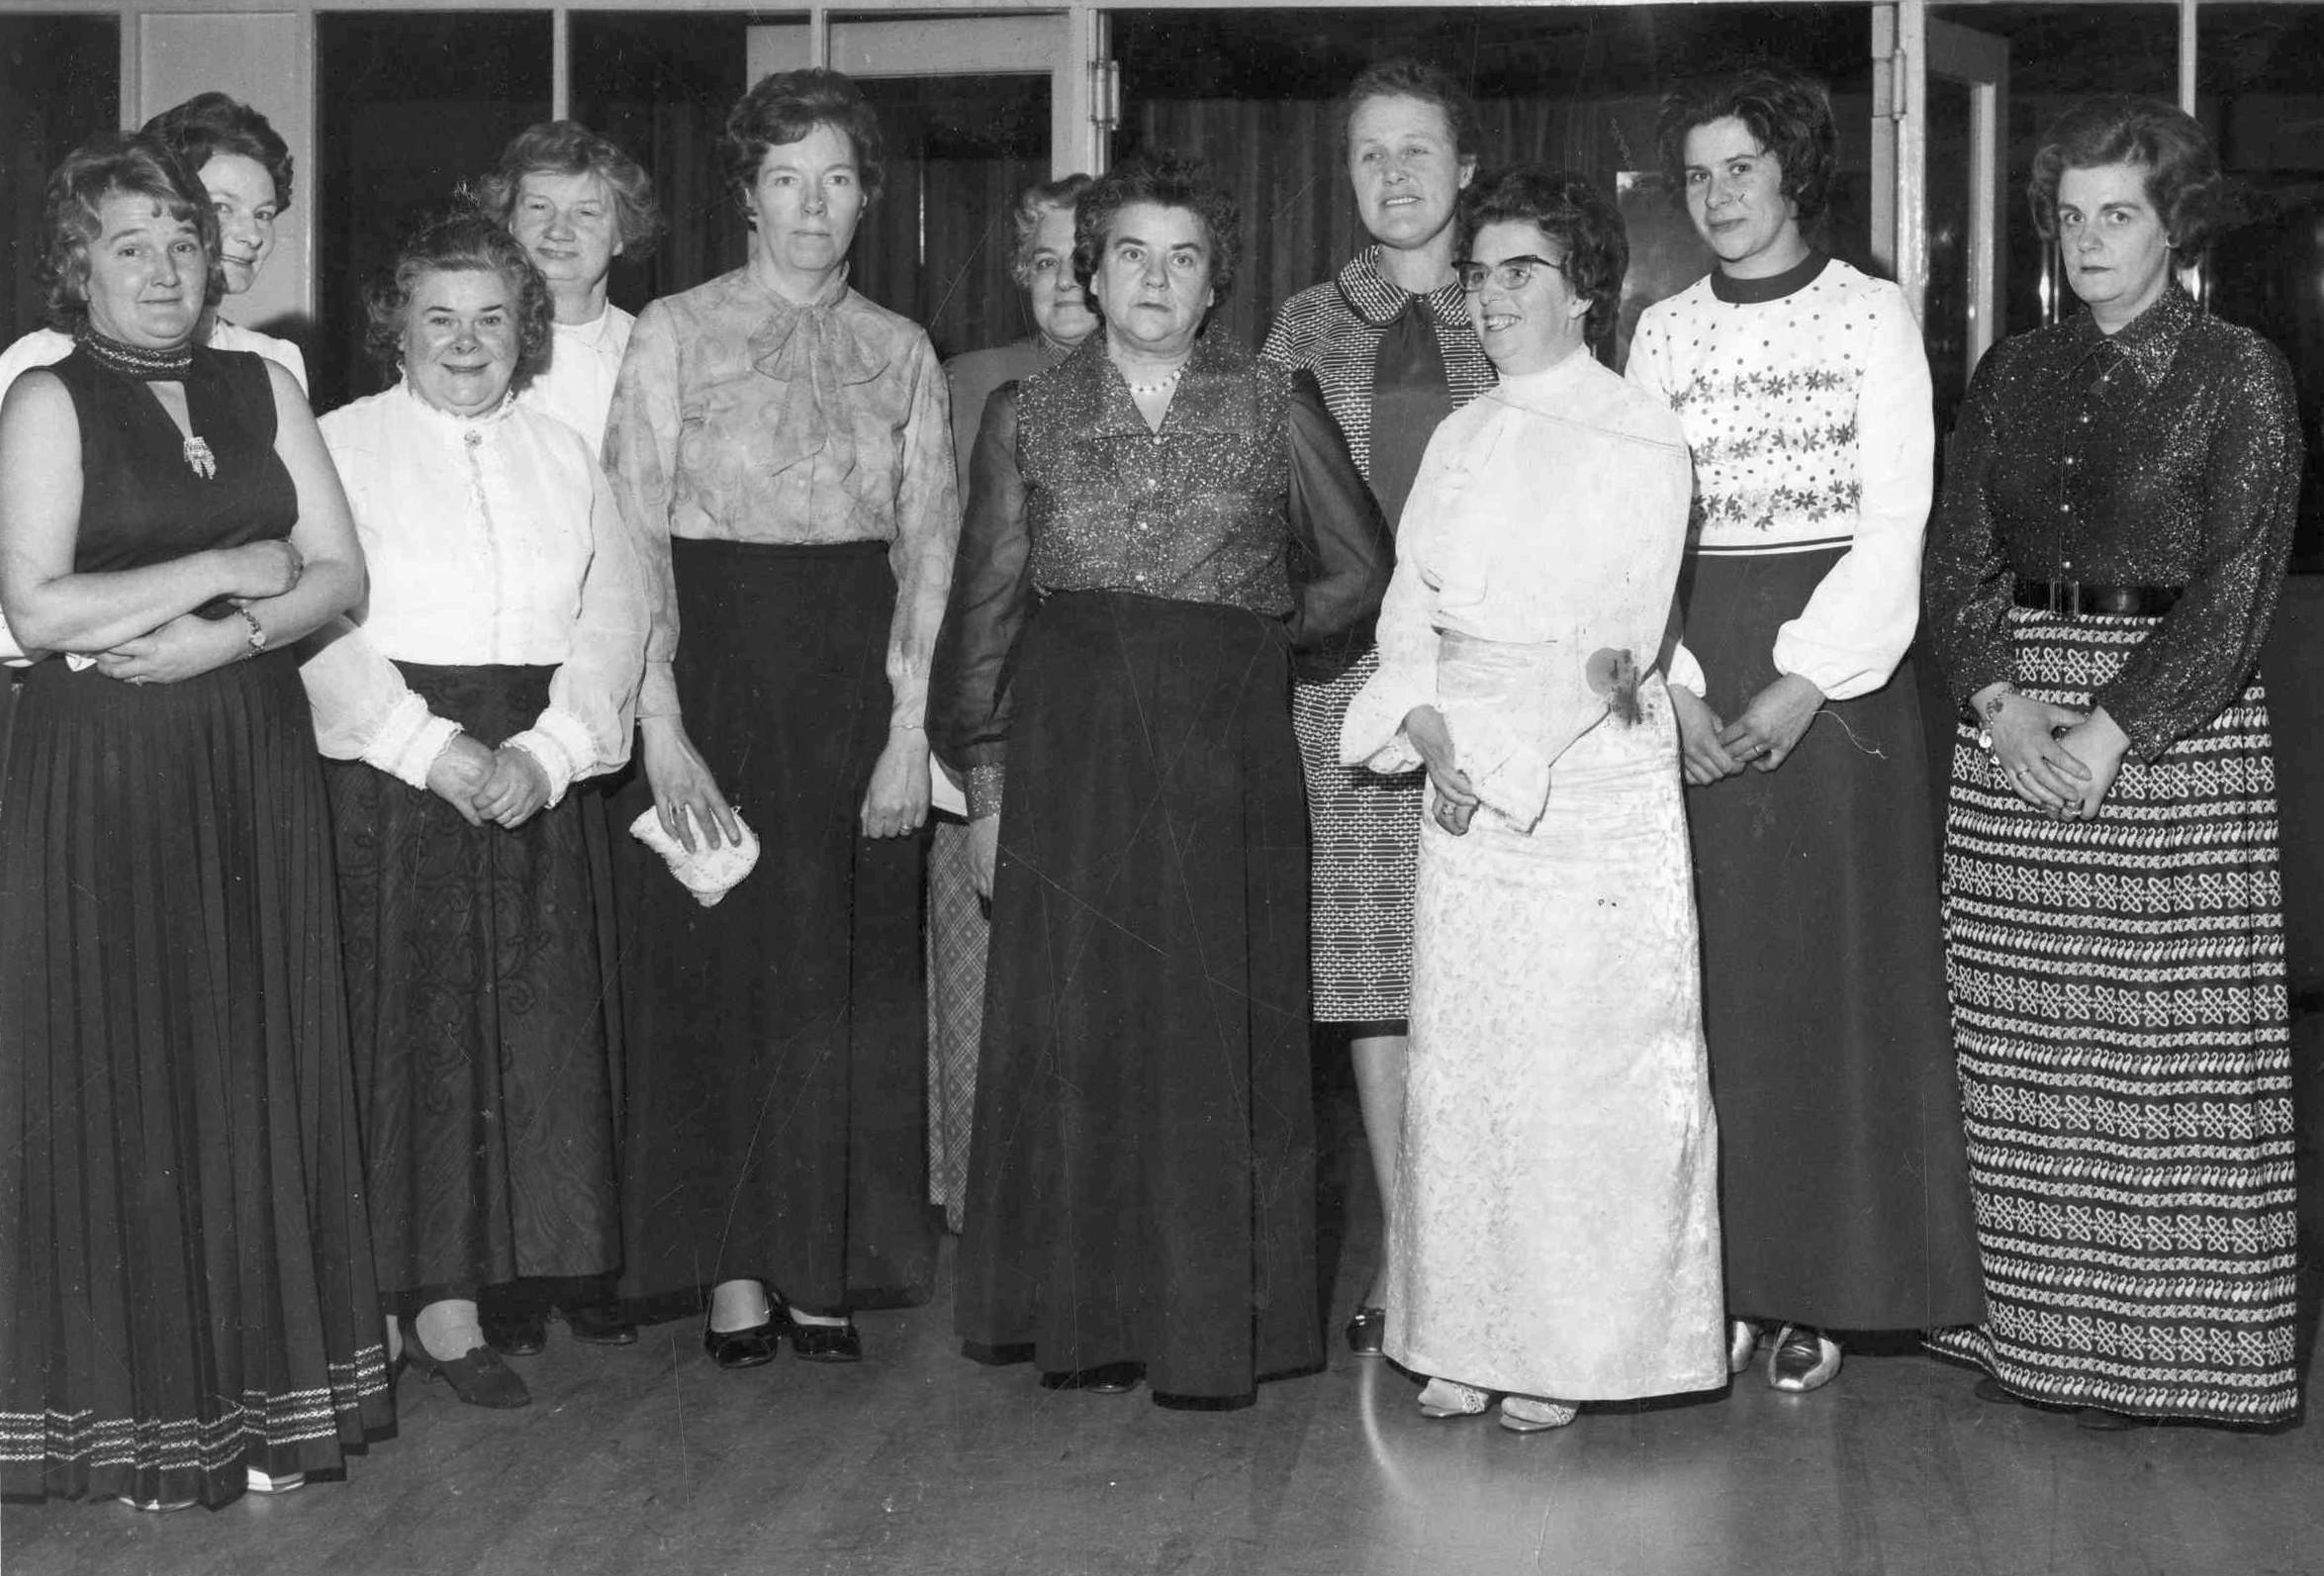 WI-Scary ladies in long skirts.jpg